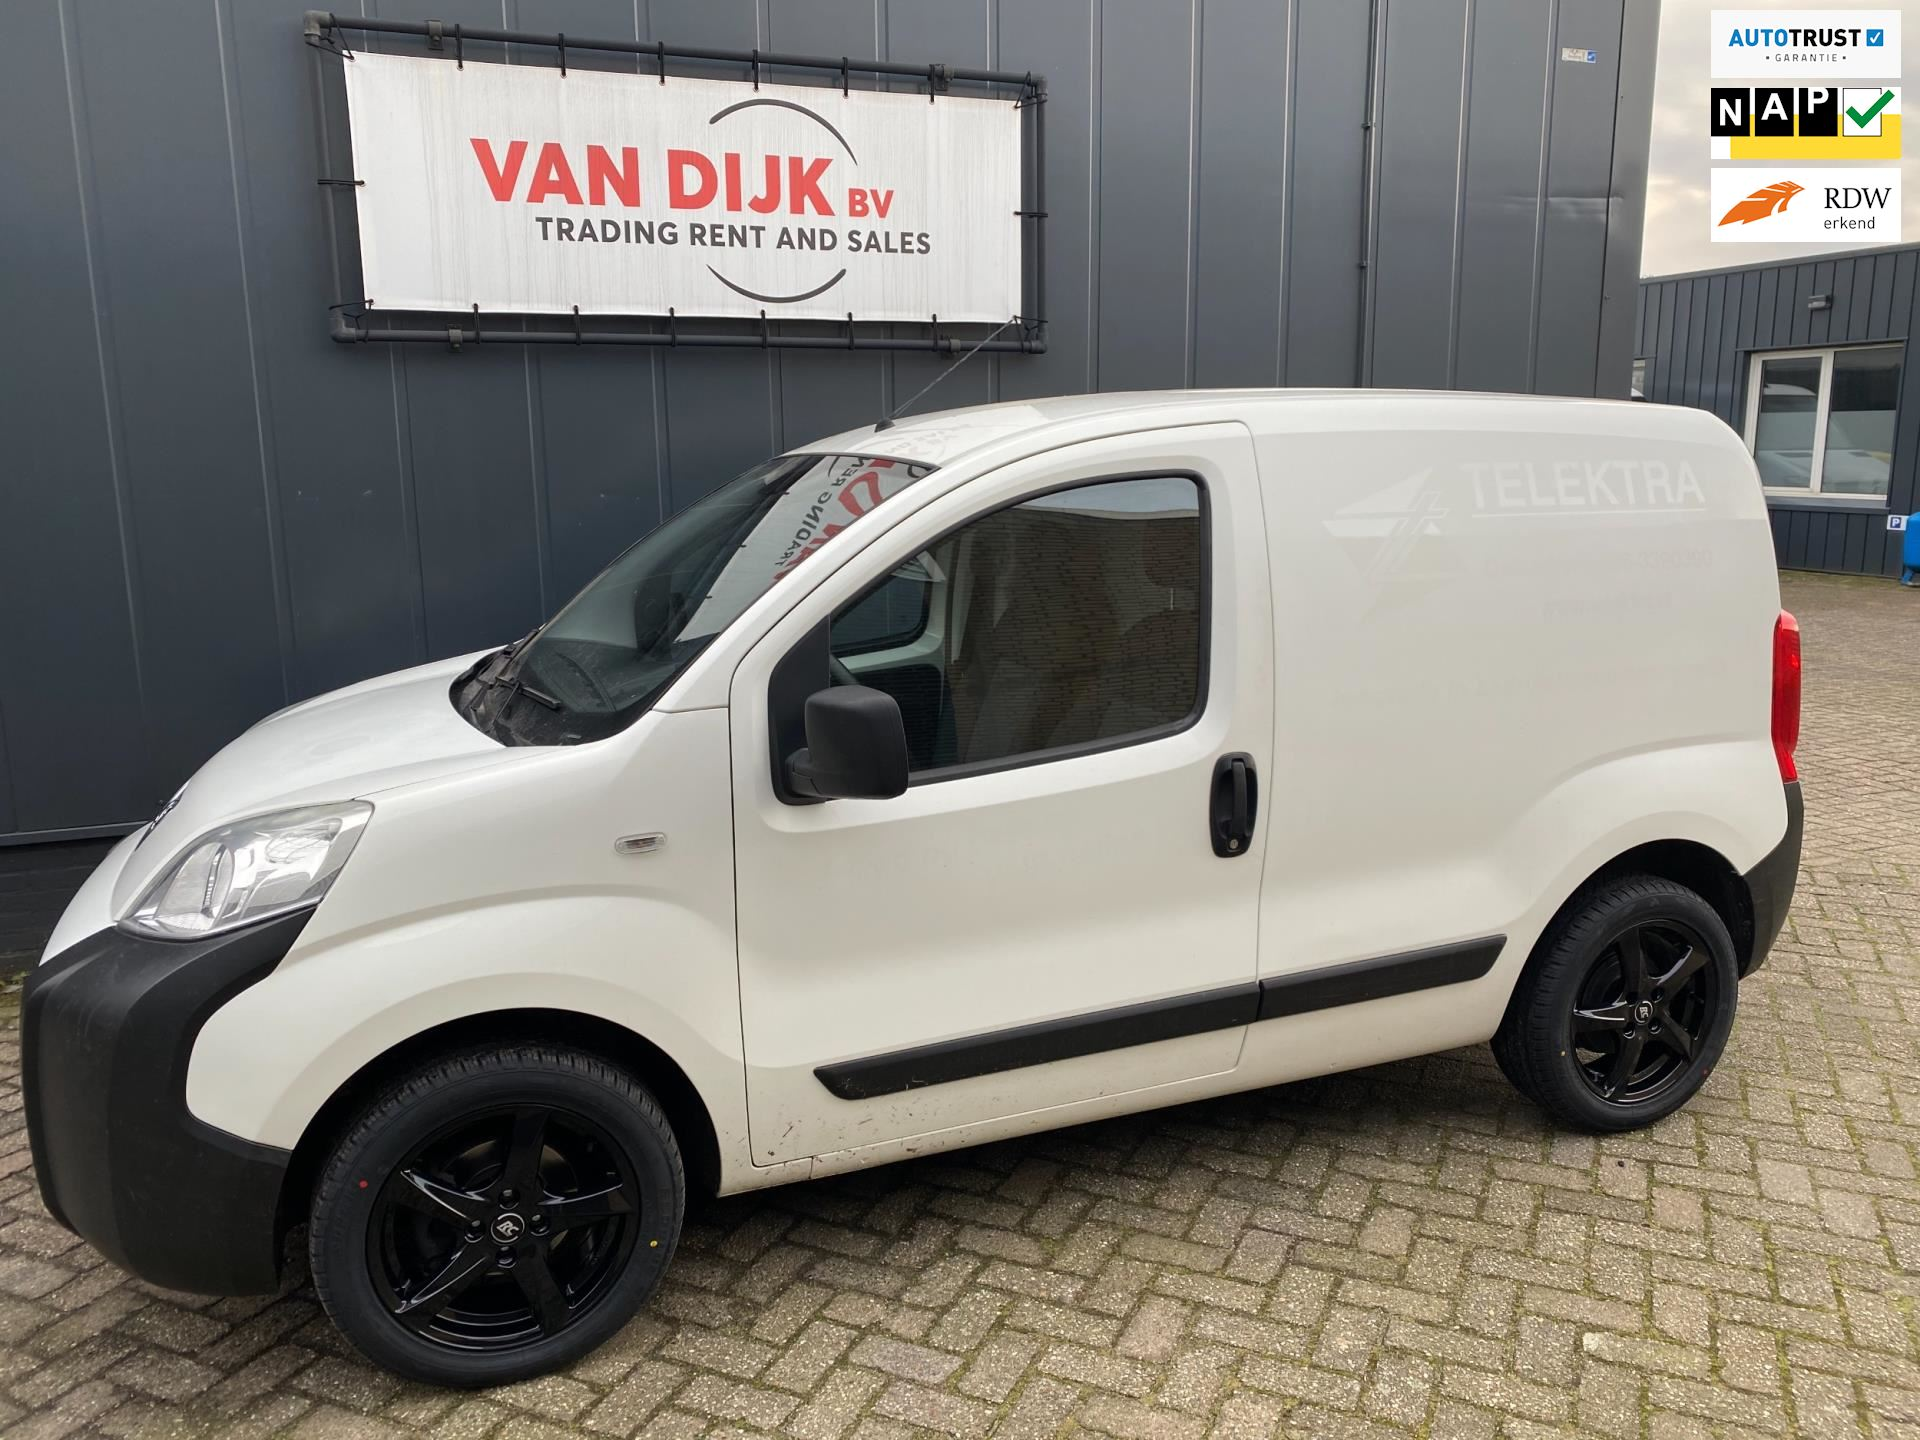 Peugeot Bipper occasion - Autobedrijf van Dijk